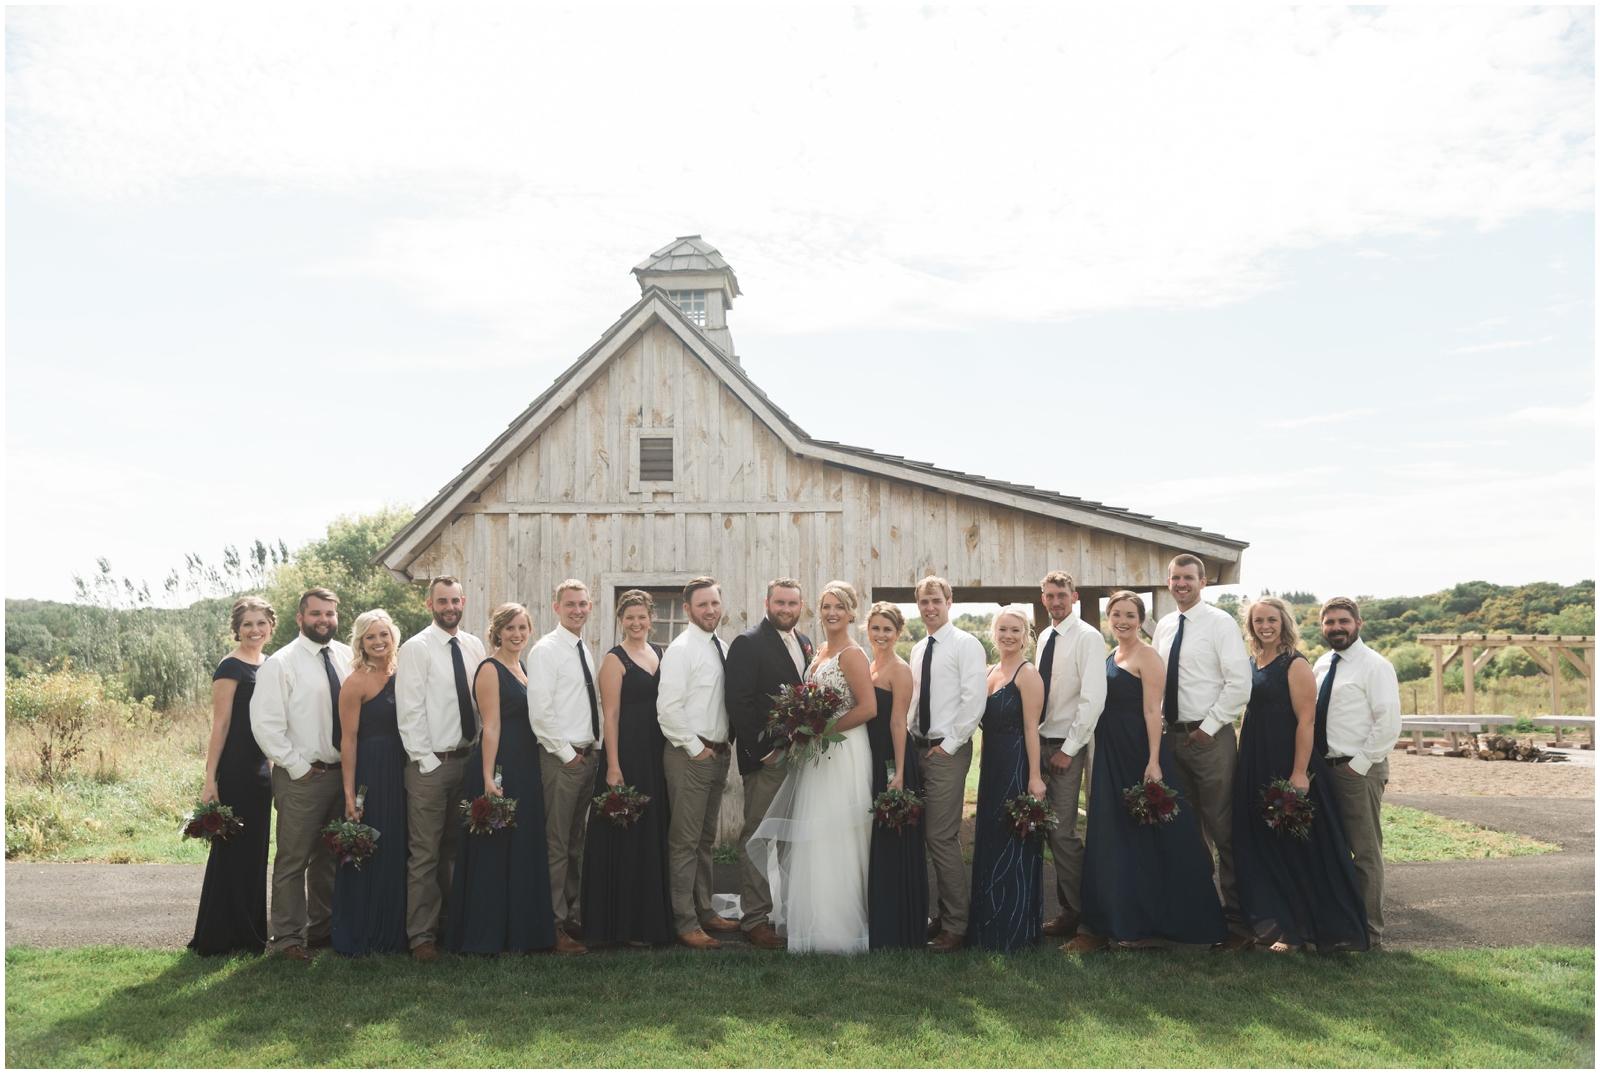 Minnesota-Wedding-Venue- Chaska-MN-Rustic-Barn-Weddings_0588.jpg